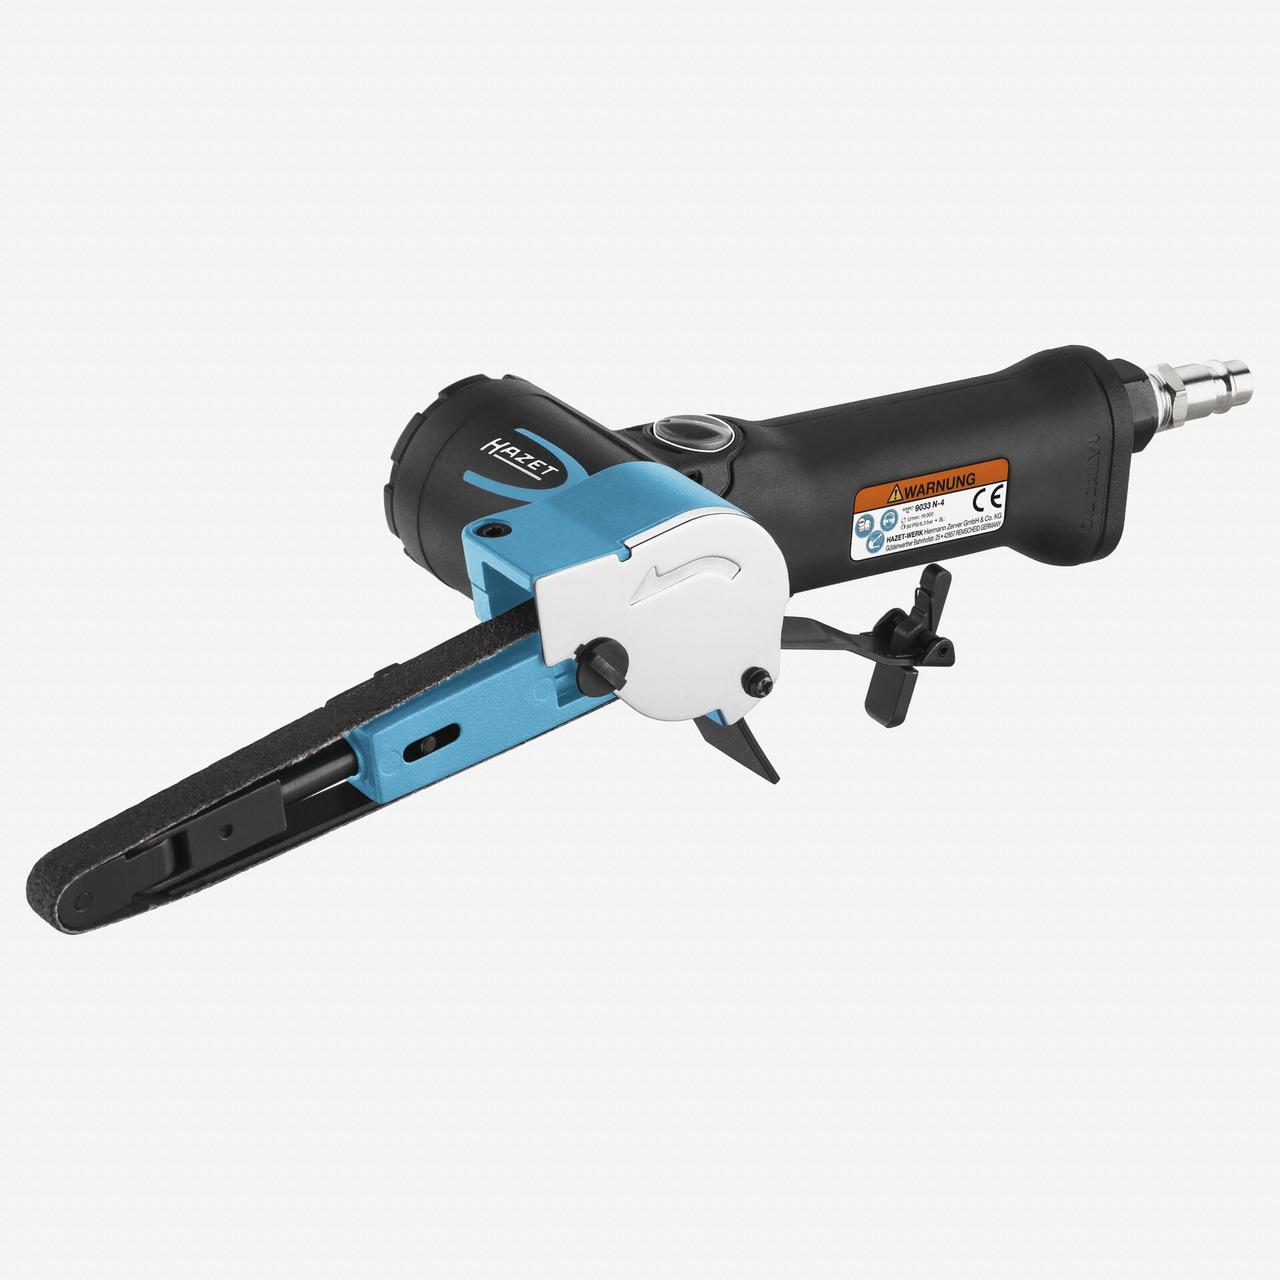 Hazet 9033N-4 Pneumatic Belt Sander - KC Tool